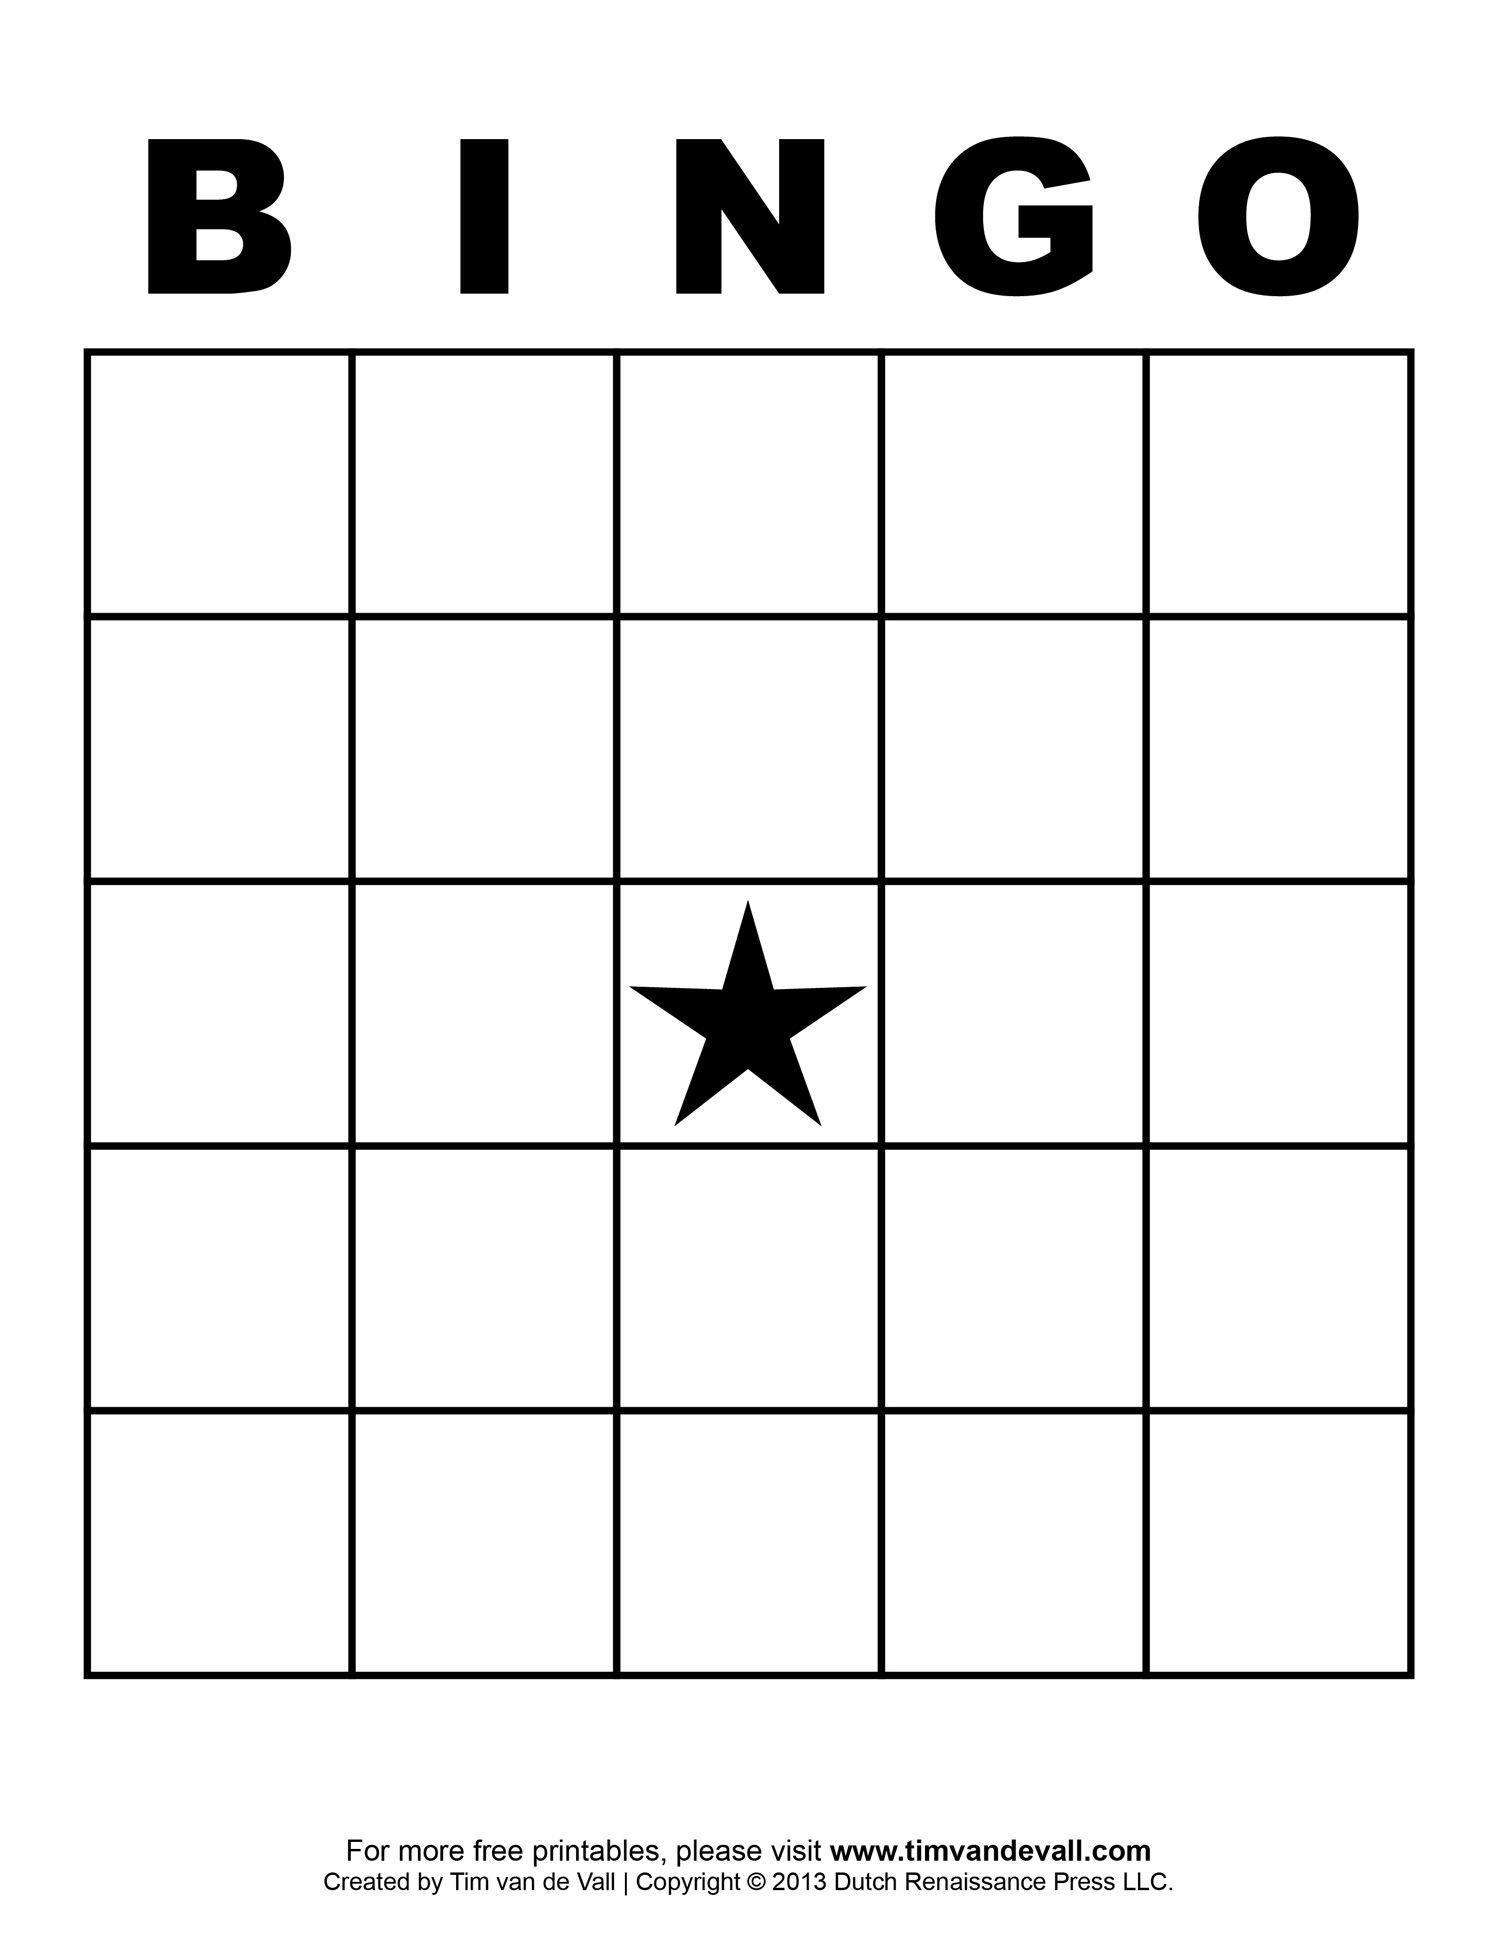 Free Printable Blank Bingo Cards Template 4 X 4 | Classroom | Blank - Free Printable Bingo Cards And Call Sheet